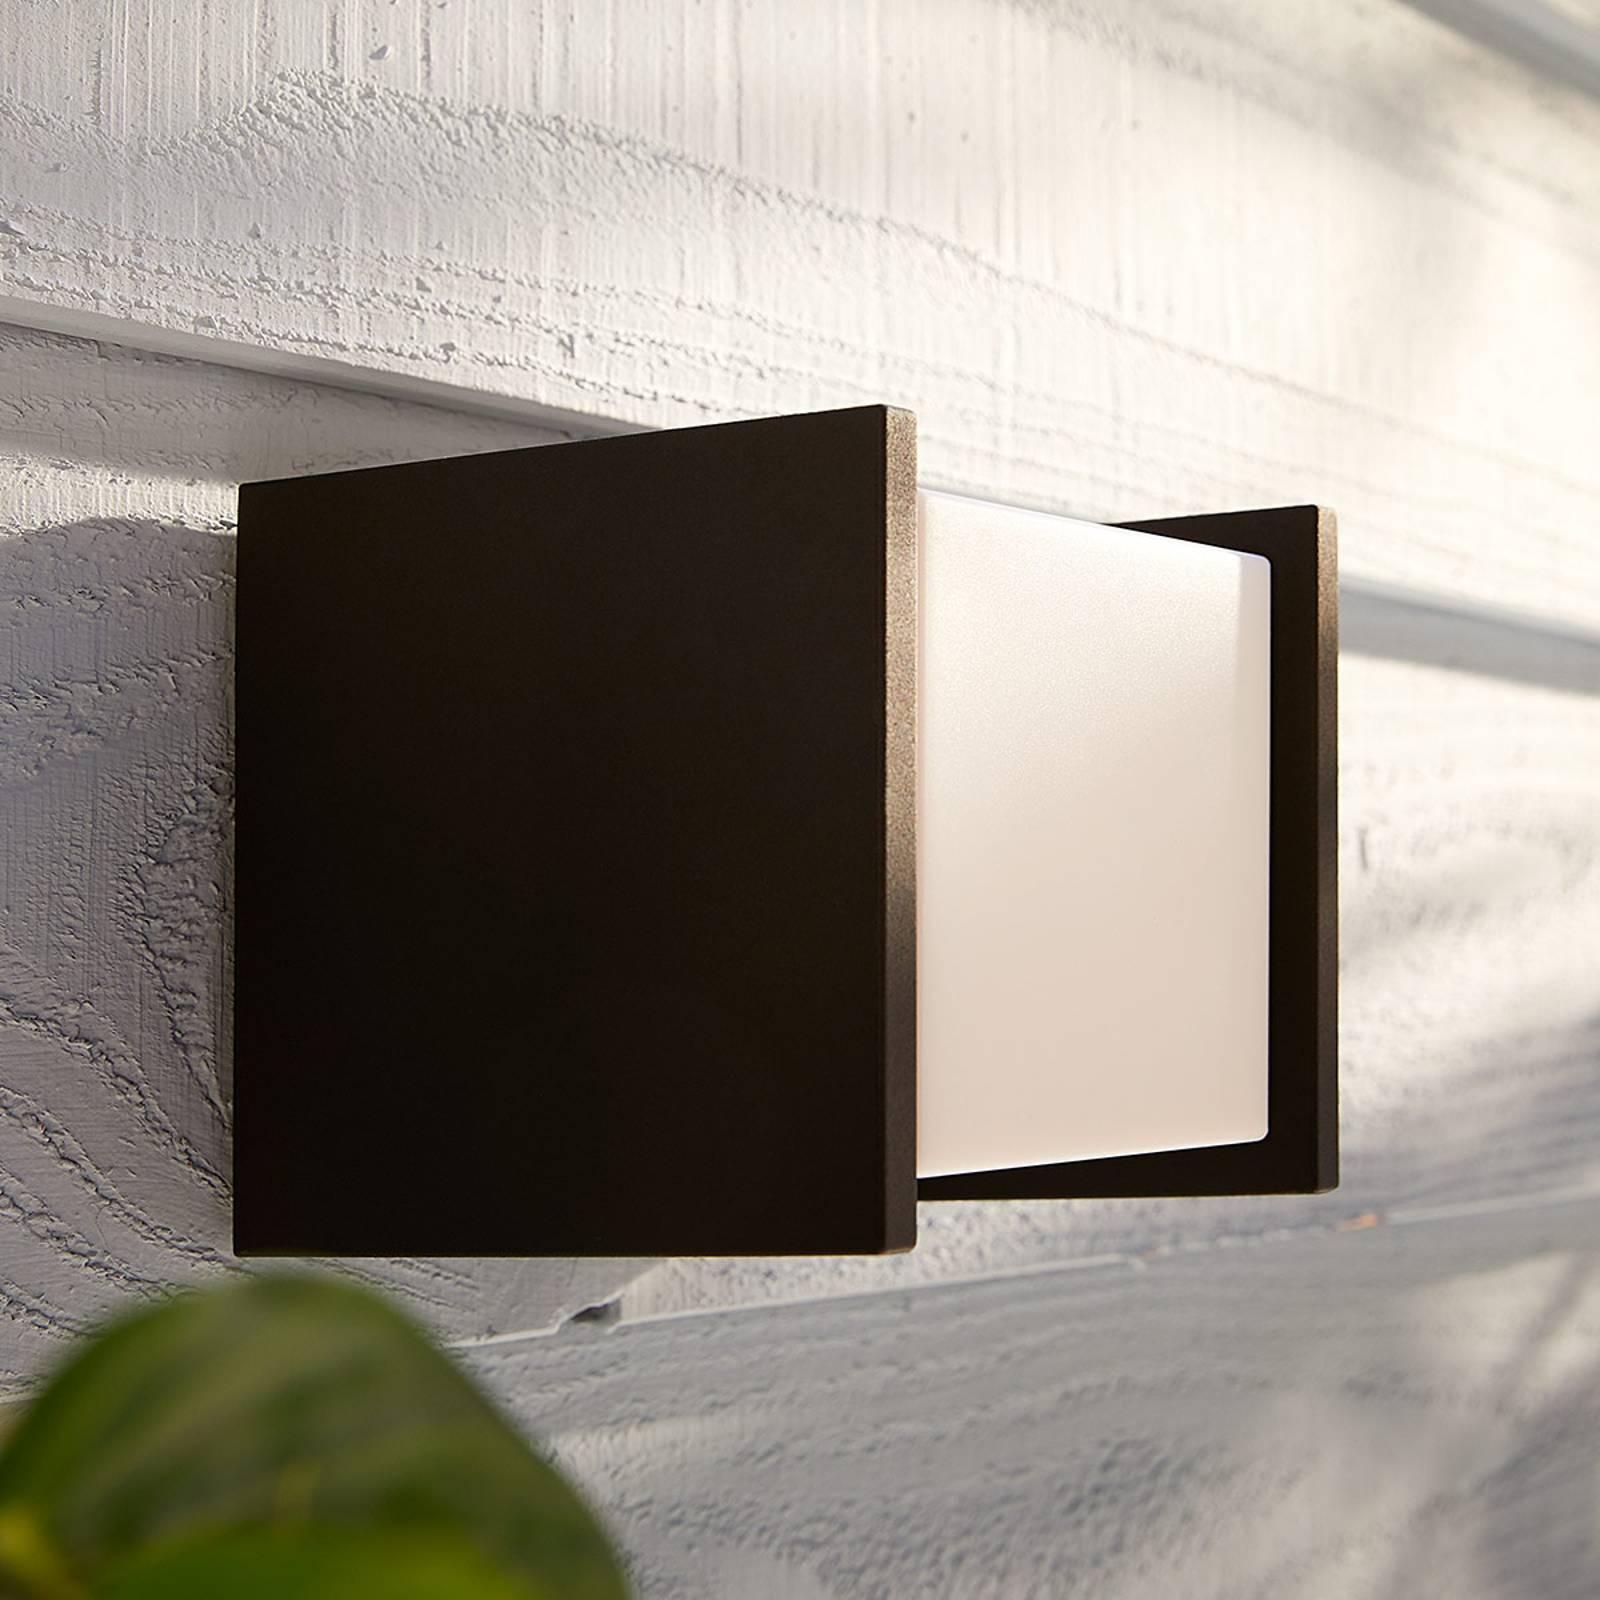 Philips Hue White Fuzo ulkoseinävalaisin, 13x14 cm